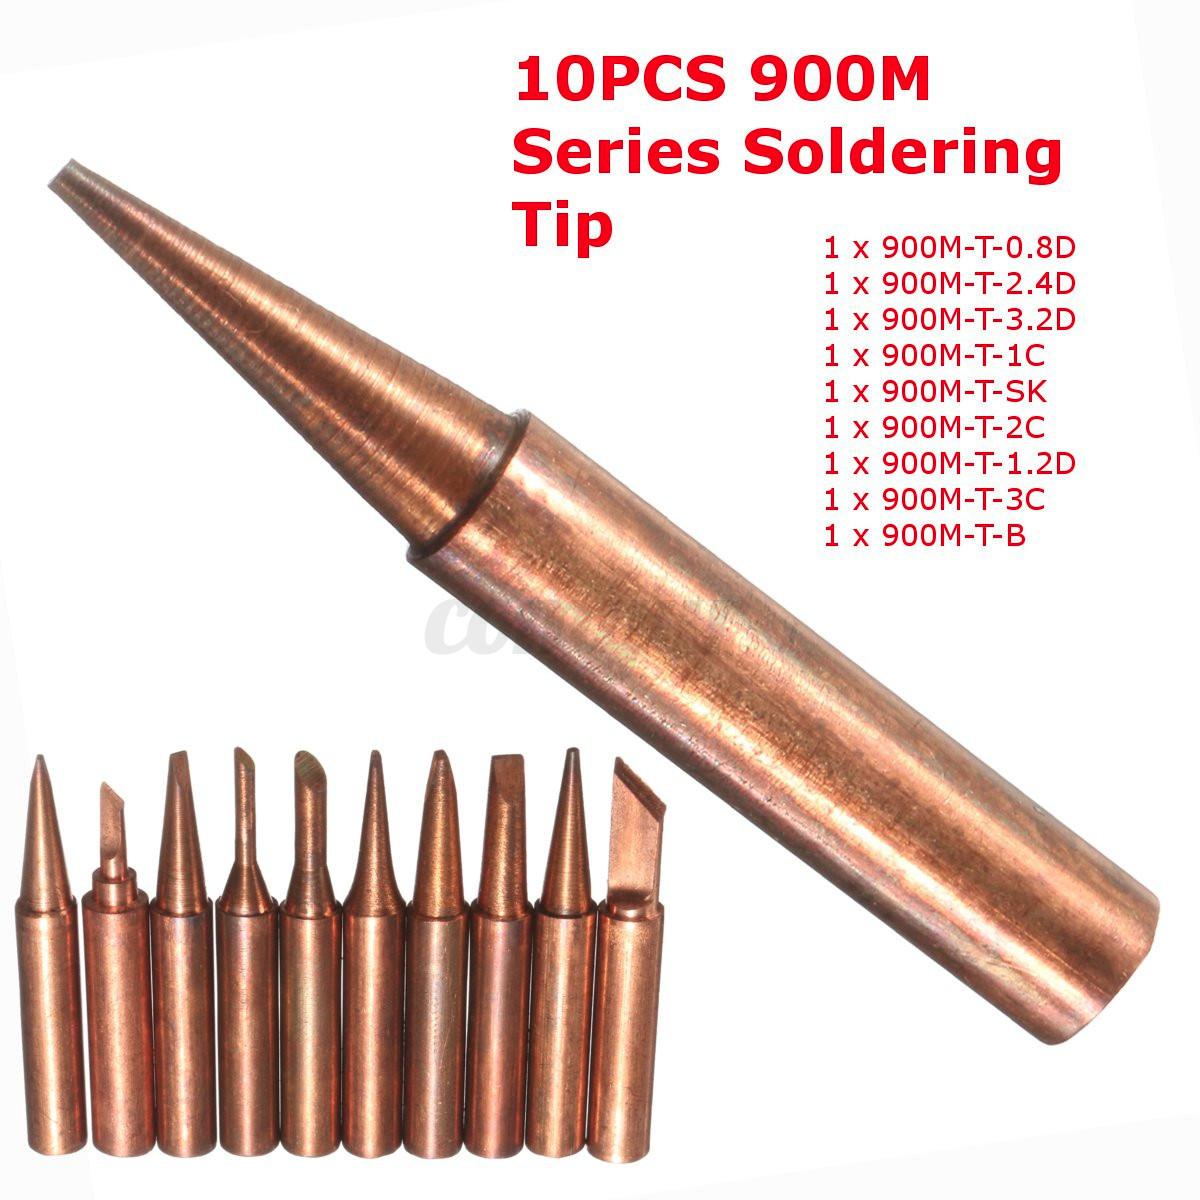 10 pure copper soldering solder iron tip for 900m series 852d iron hot air gu. Black Bedroom Furniture Sets. Home Design Ideas